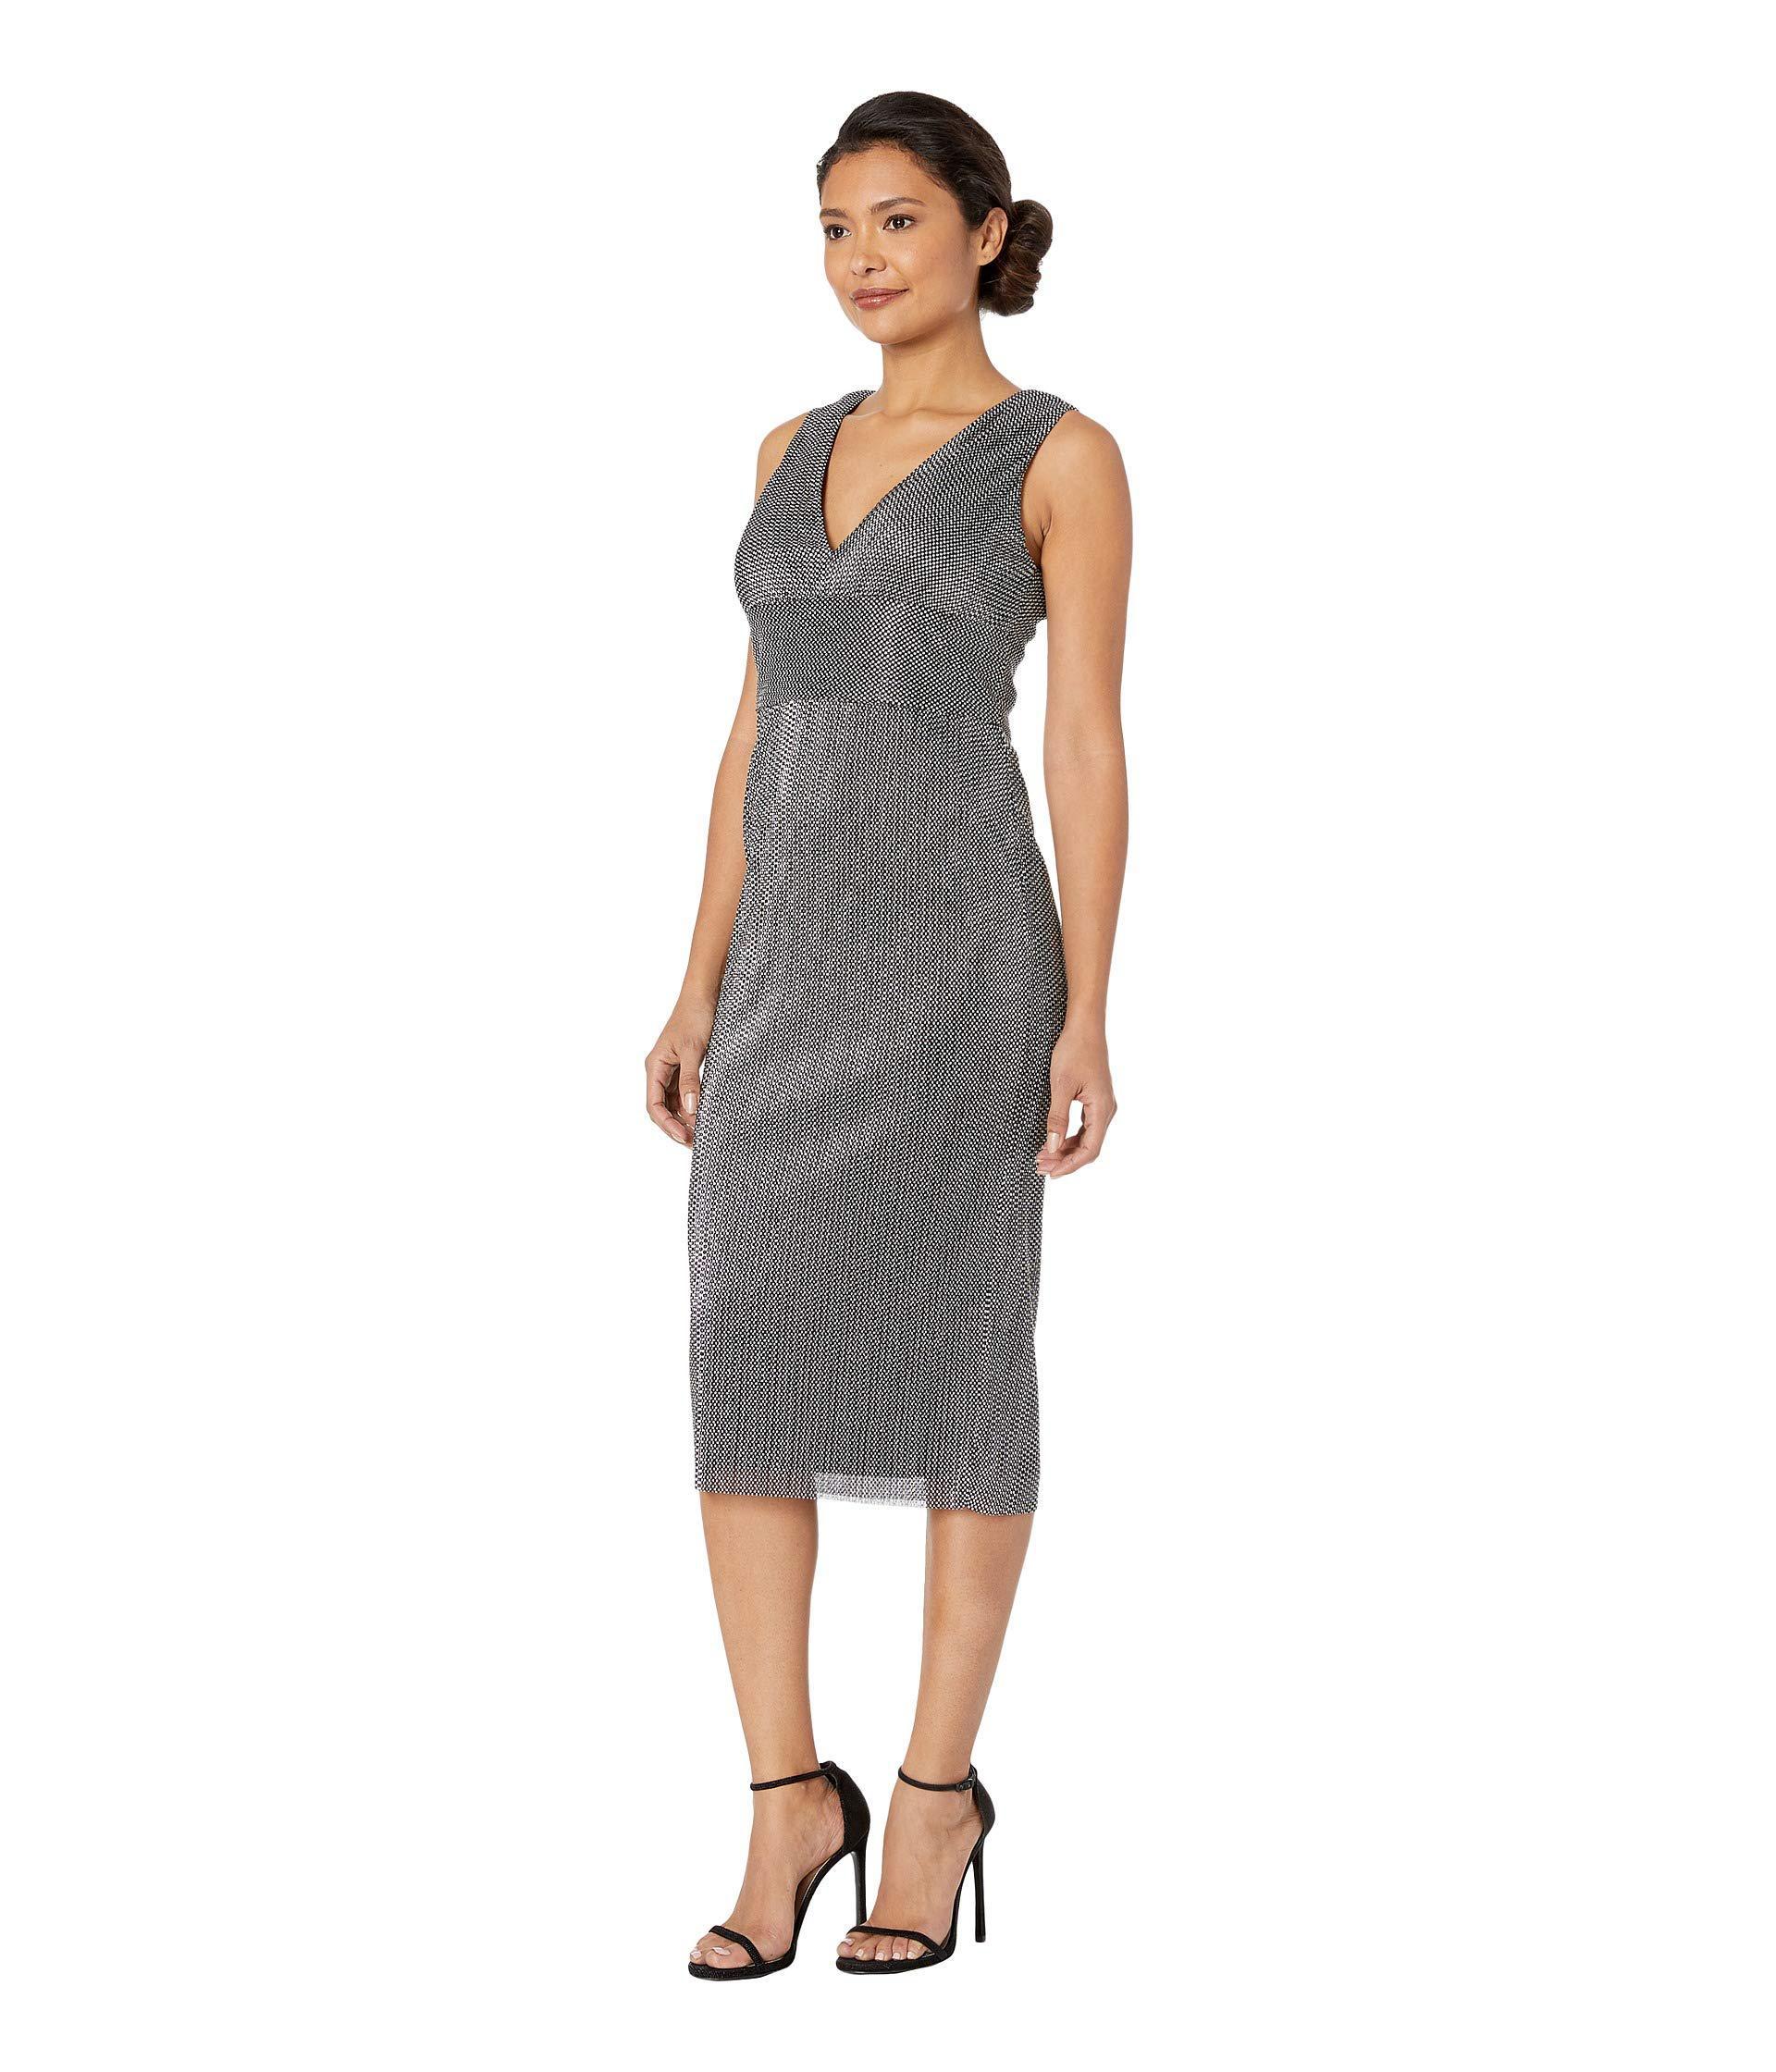 a3d2bc1179b Lyst - Adrianna Papell Sleeveless V-neckline Metallic Chain Mail Knit Midi  Dress (black) Women s Dress in Black